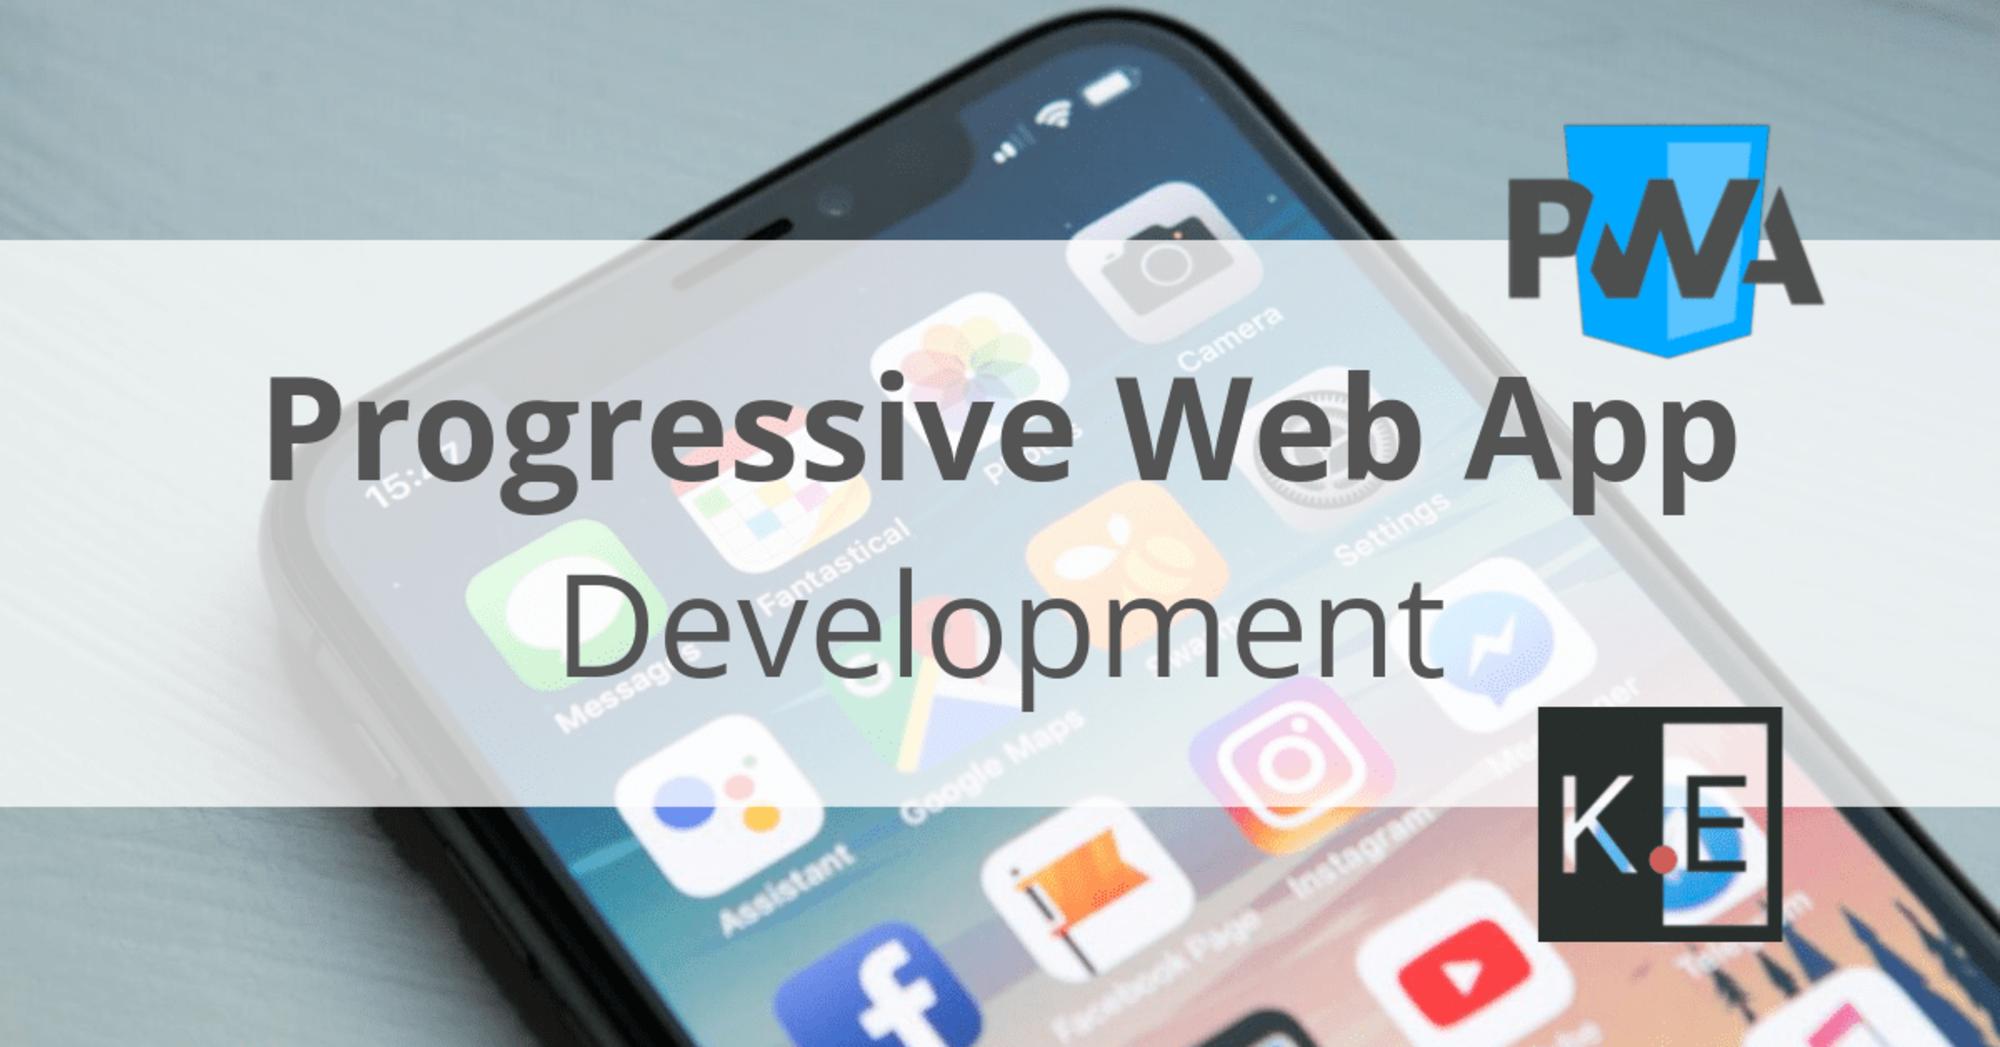 An overview of Progressive Web App development